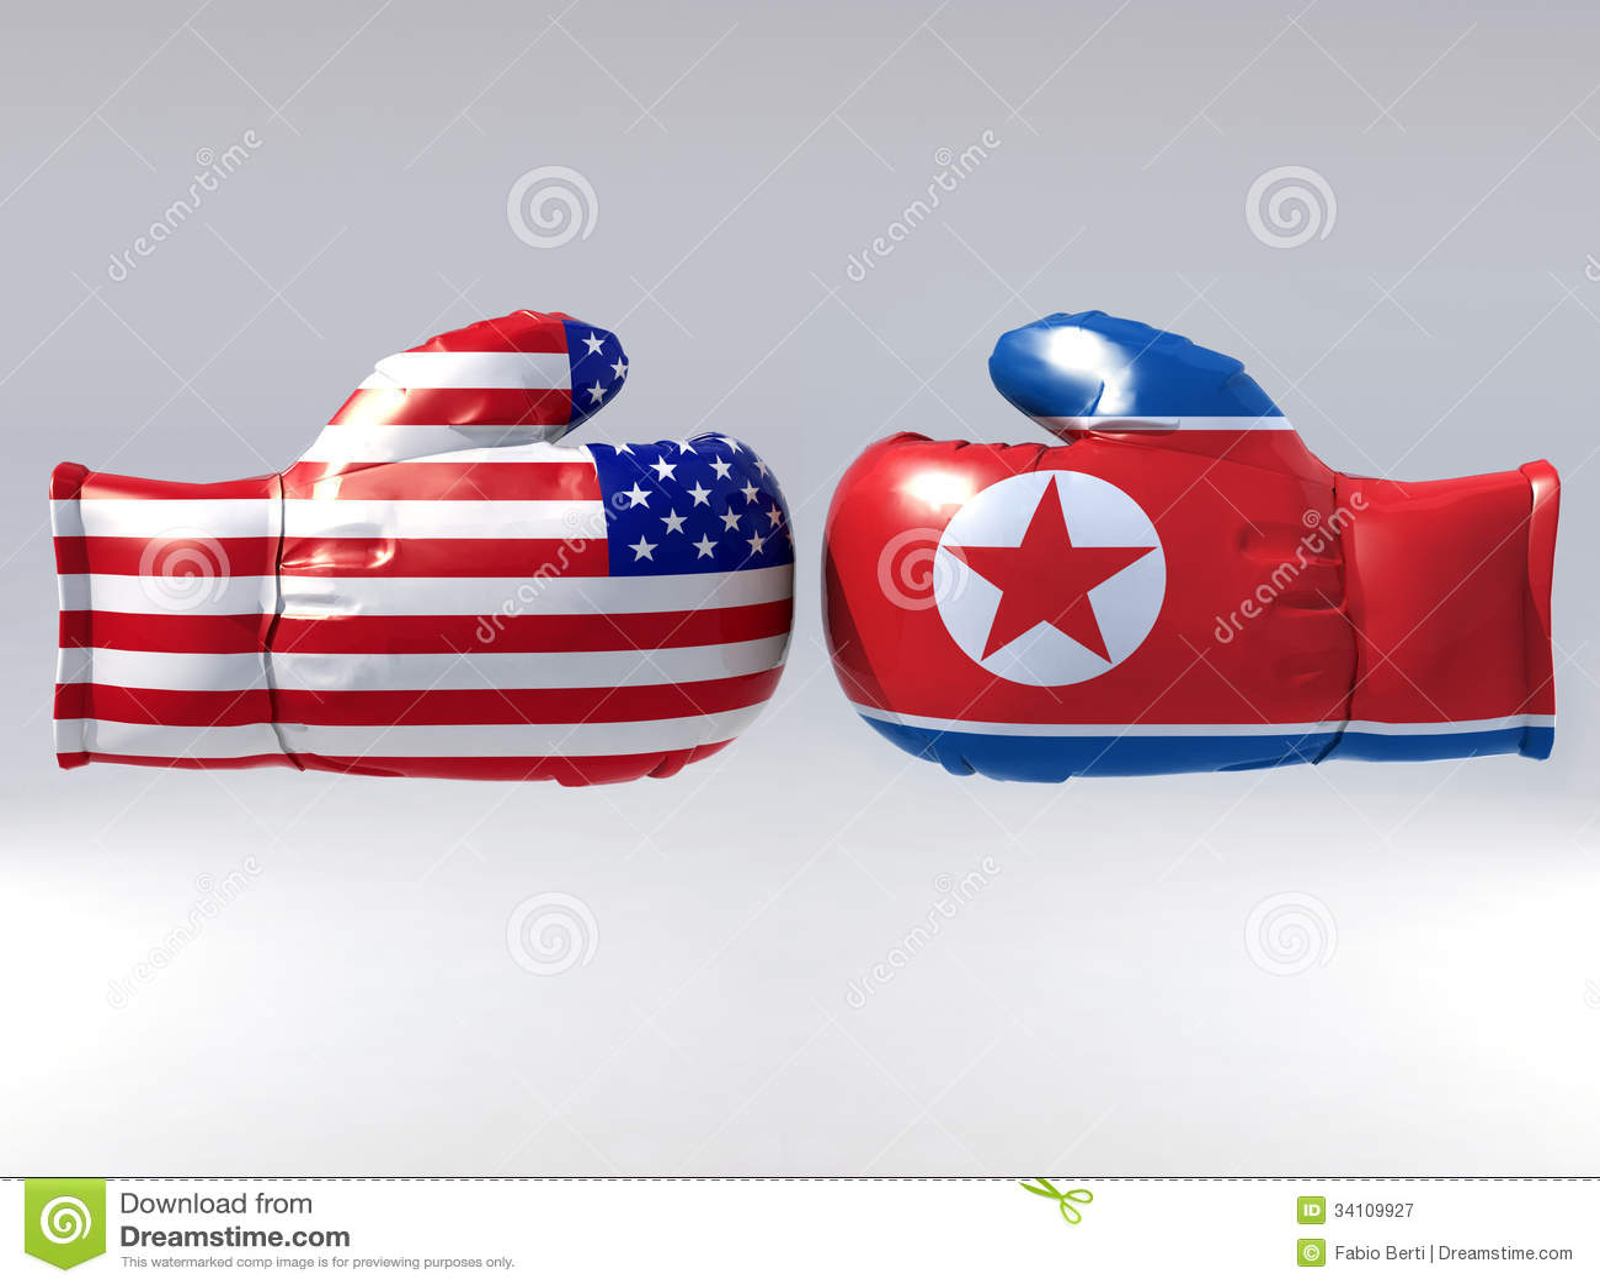 Korean american dating in usa